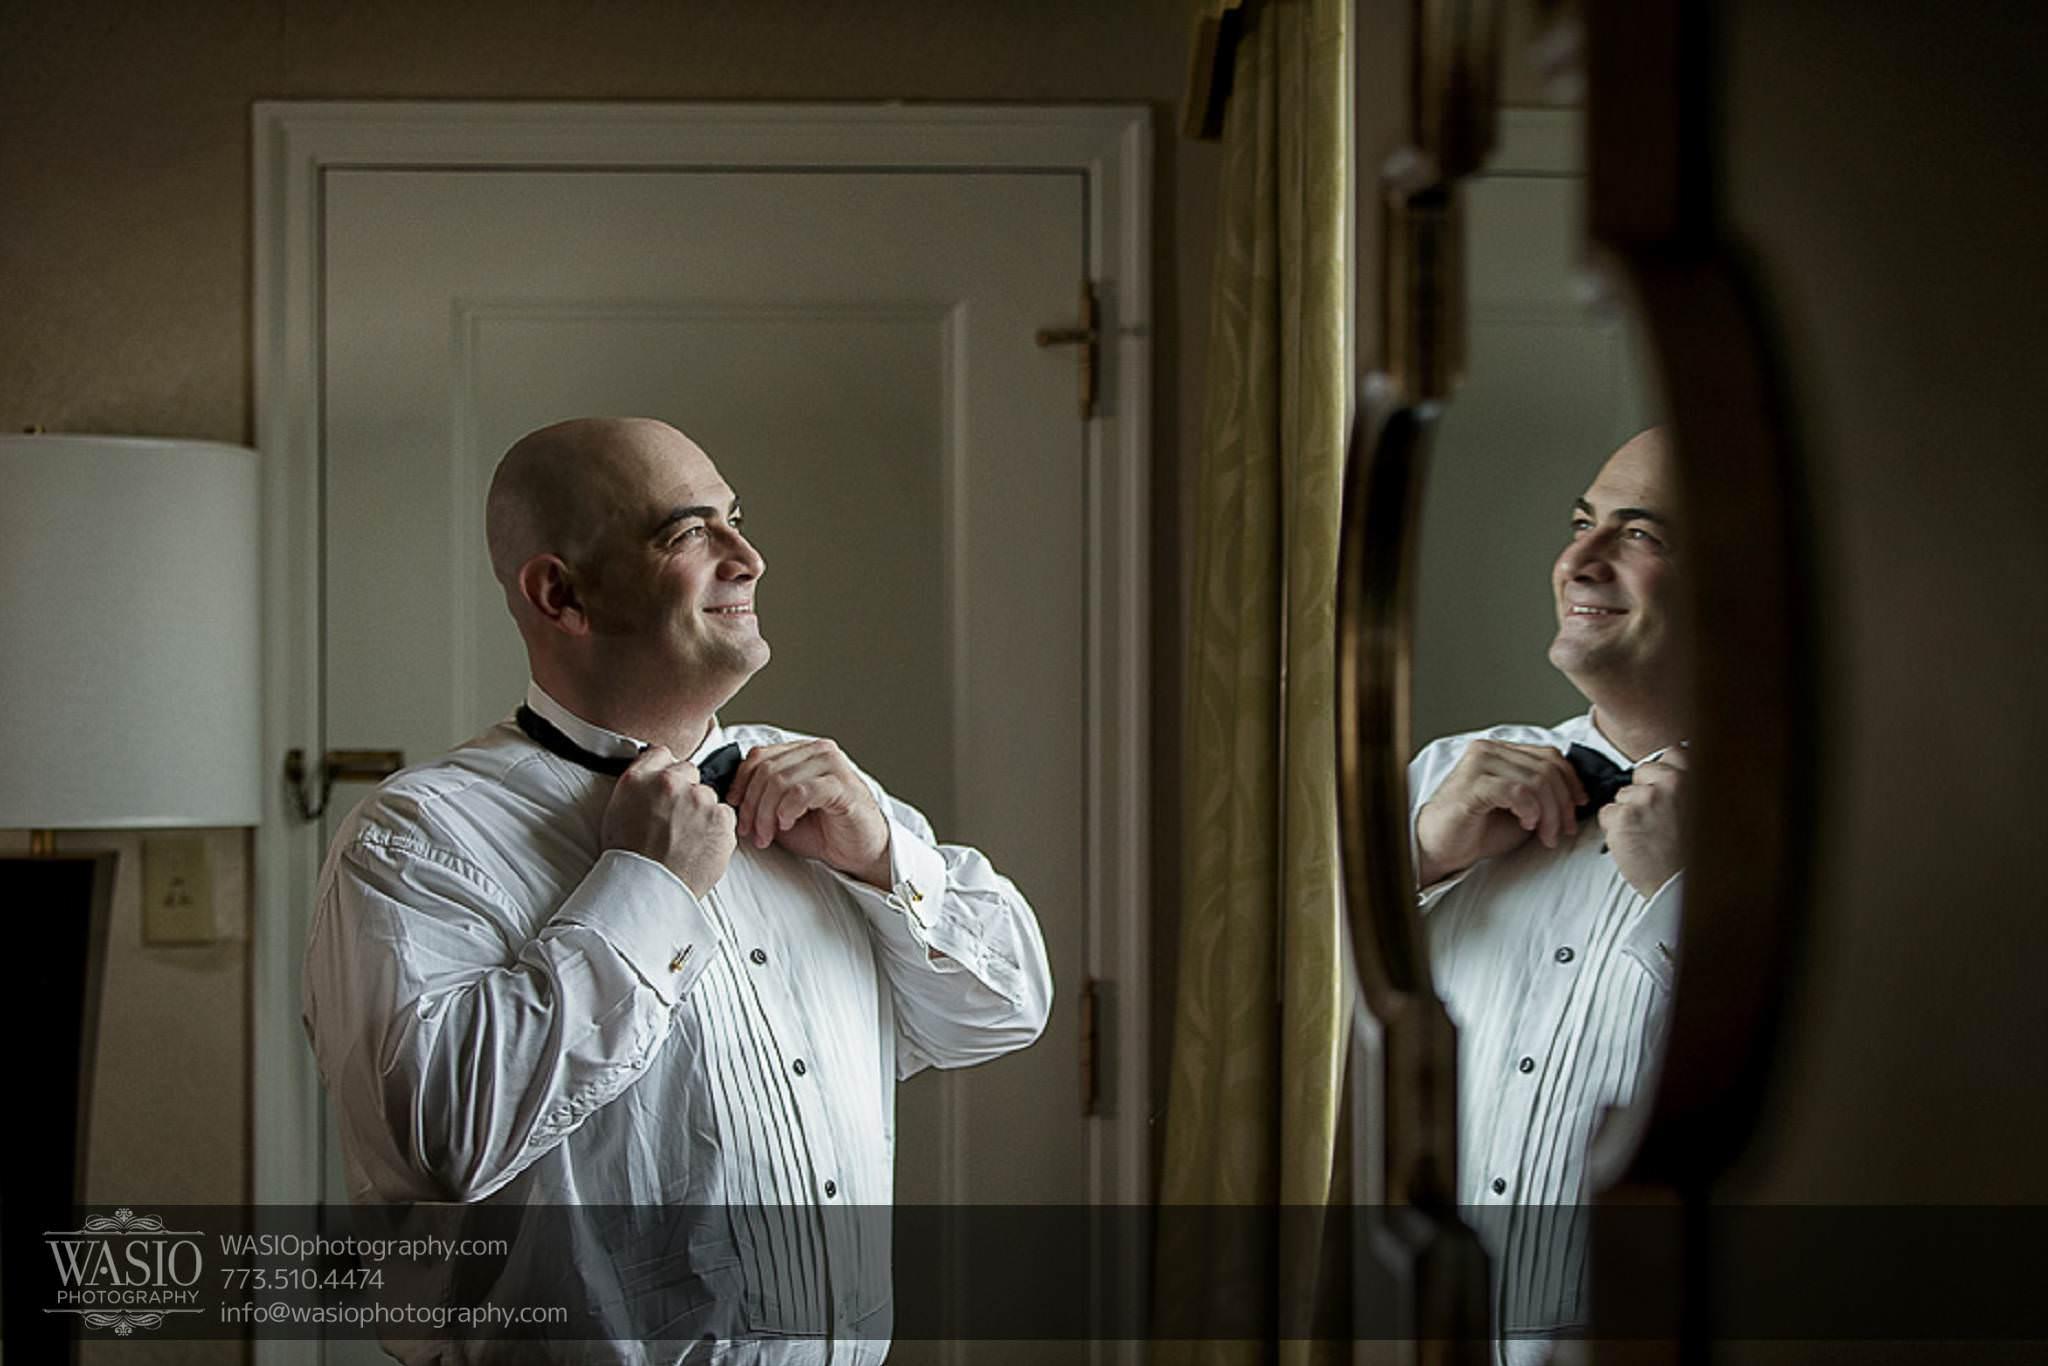 Chicago-wedding-photos-happy-groom-natural-light-smile-bow-tie-window-038 Chicago Wedding Photos - Svetlana + Yuriy